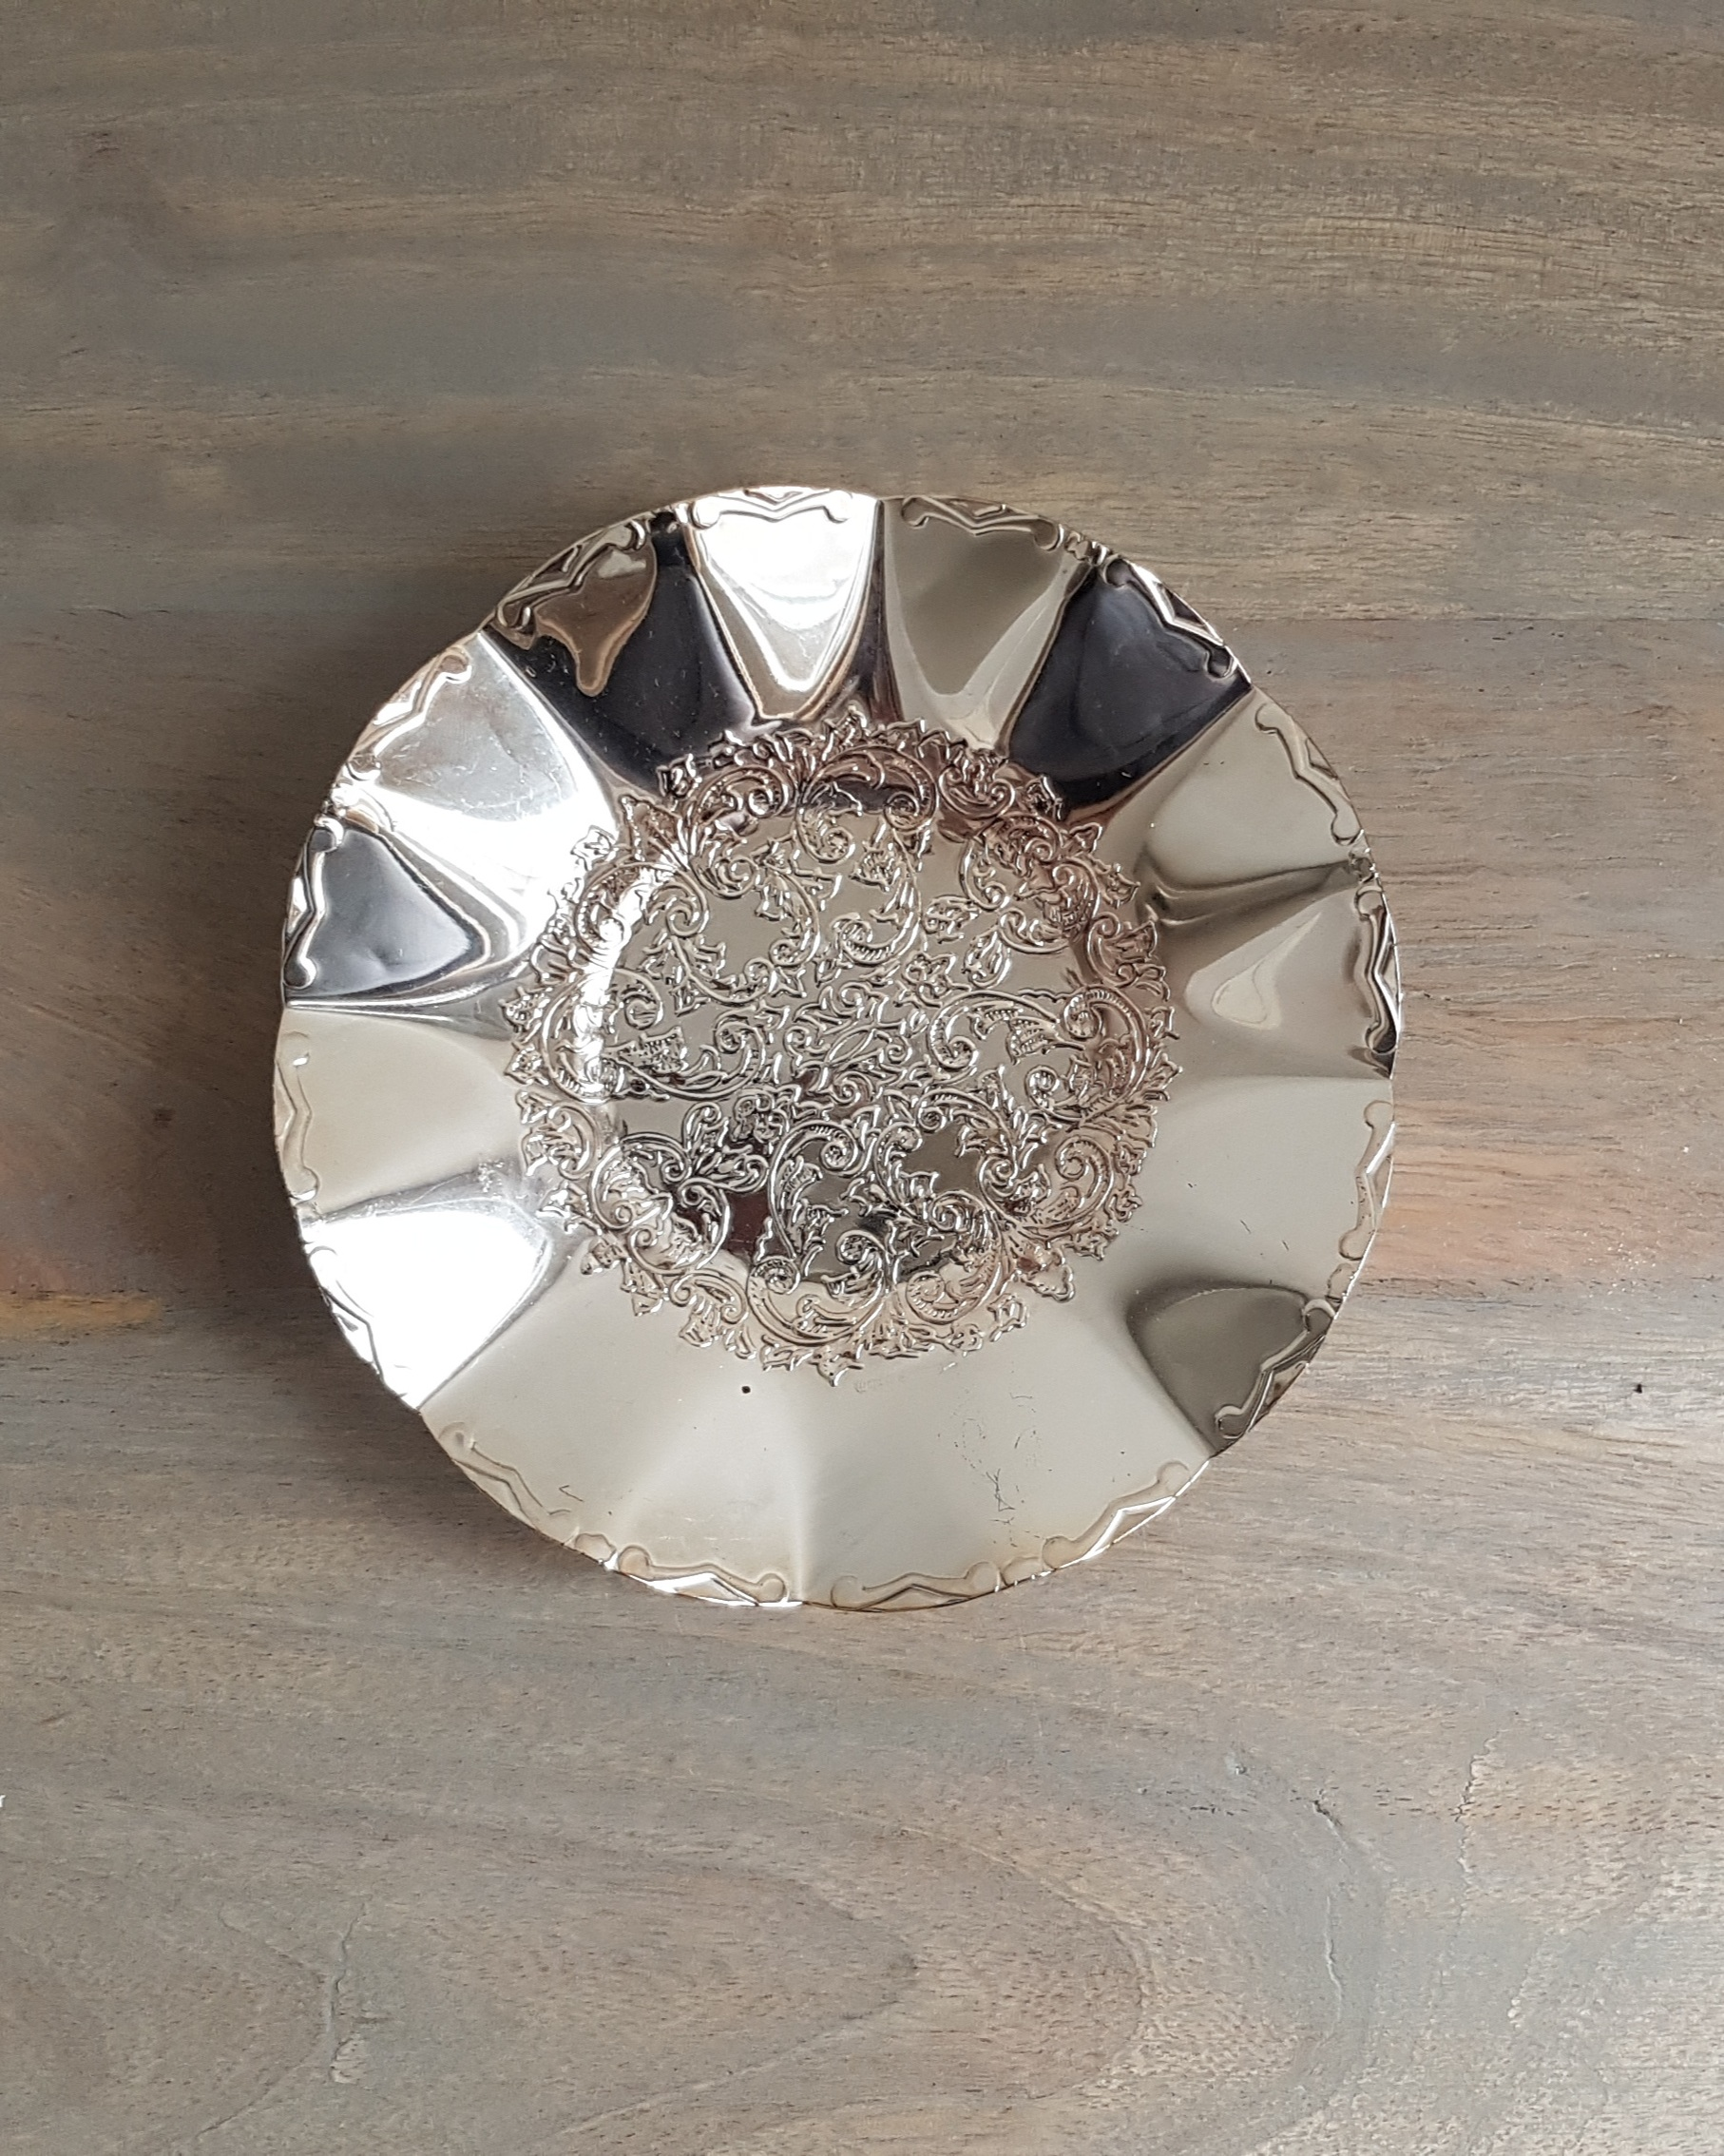 "6"" Round Antique Tray - $3"